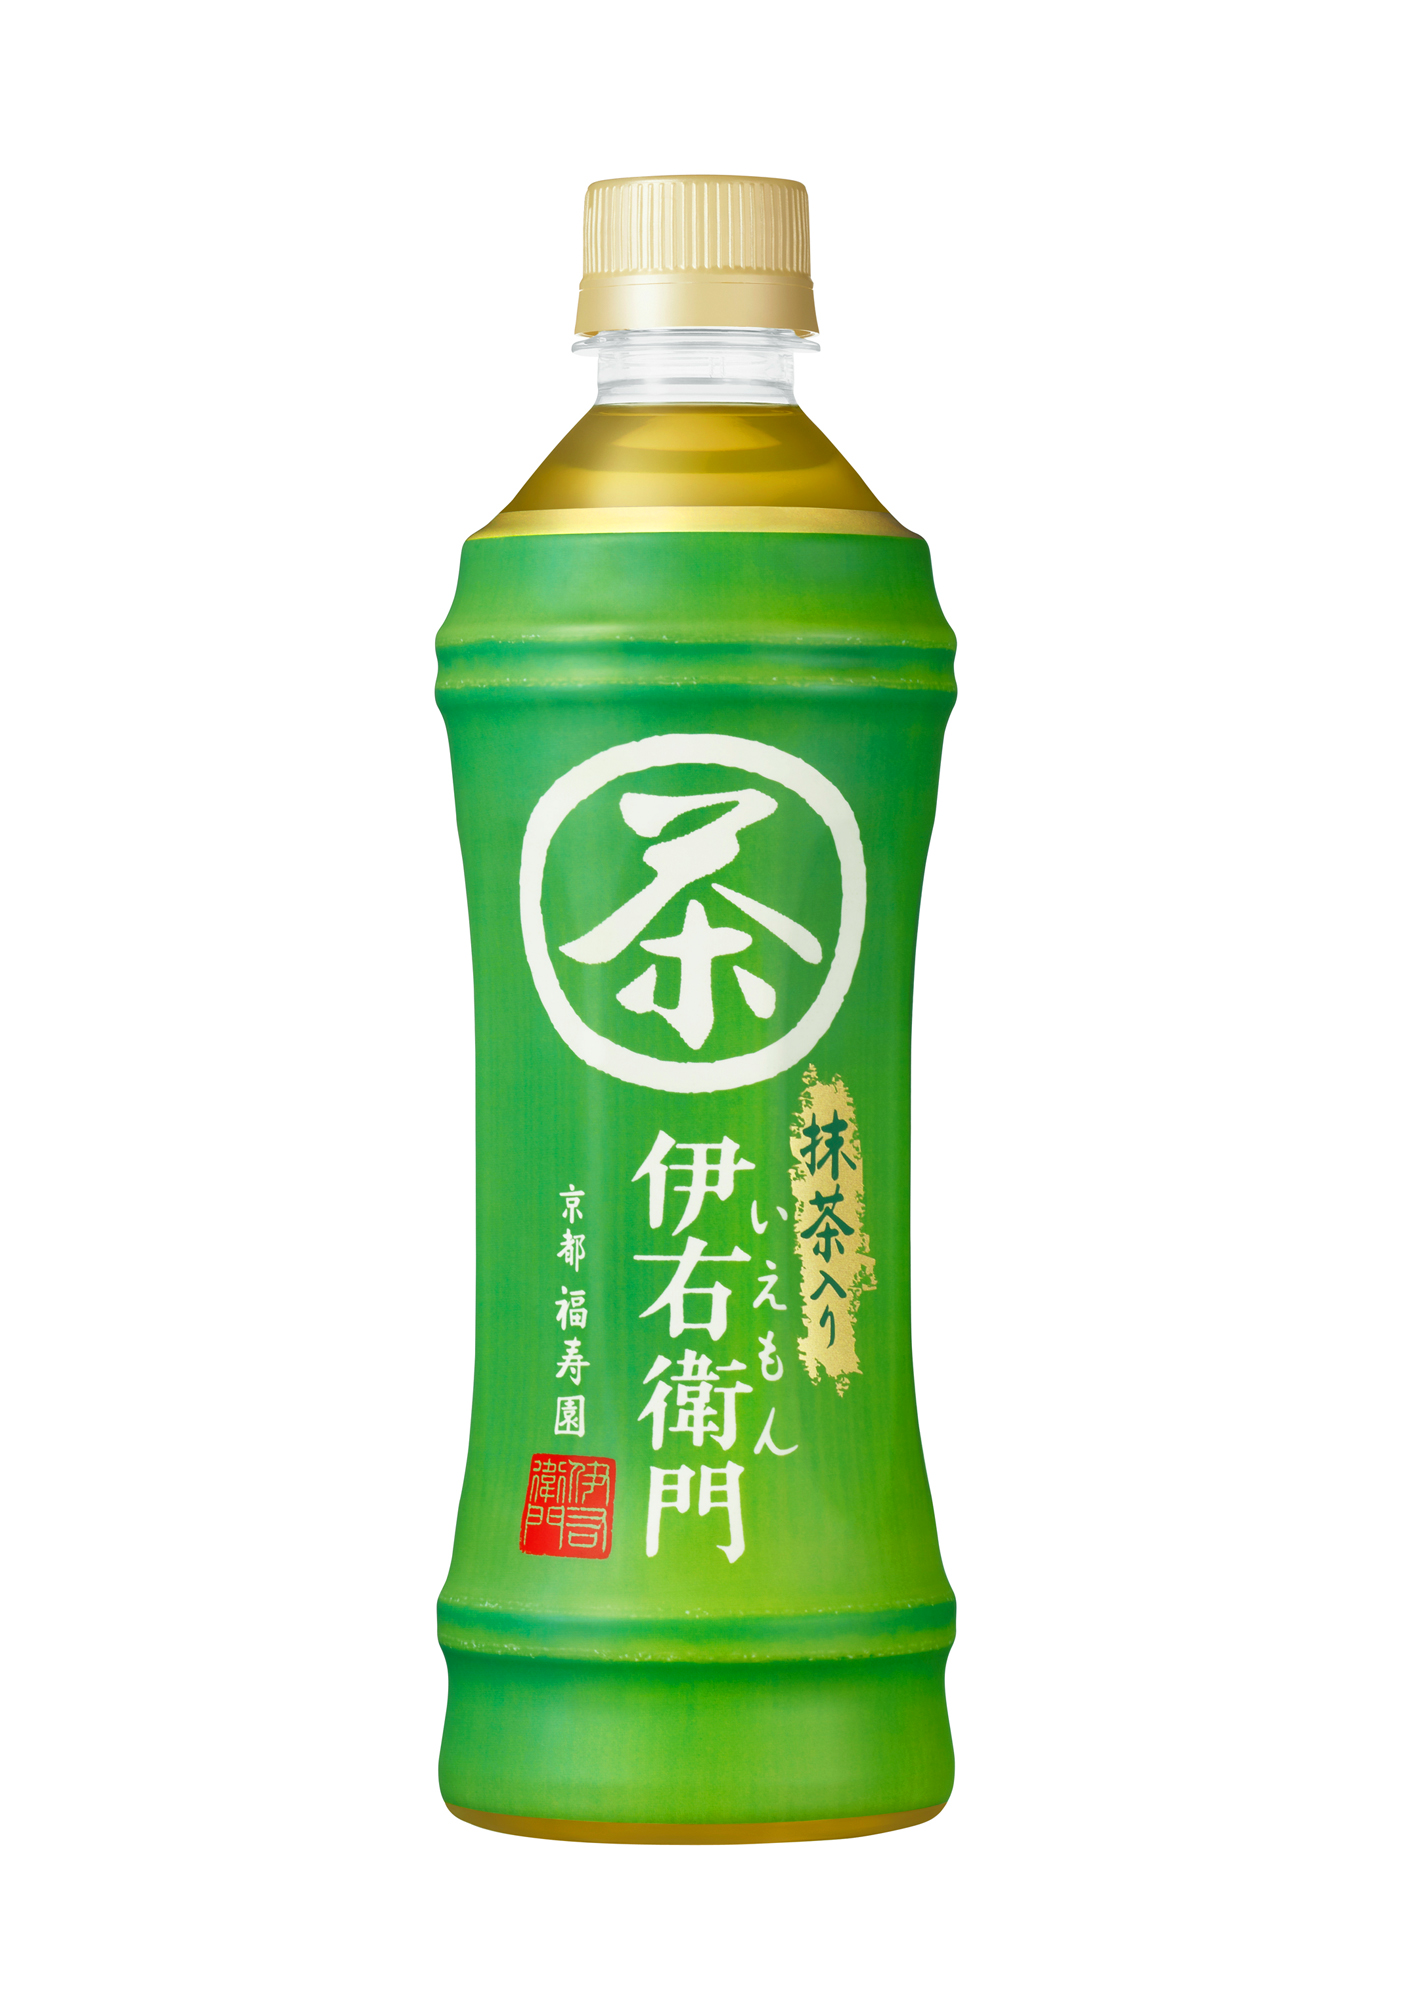 http://www.suntory.co.jp/news/2012/l_img/l_11537-1.jpg